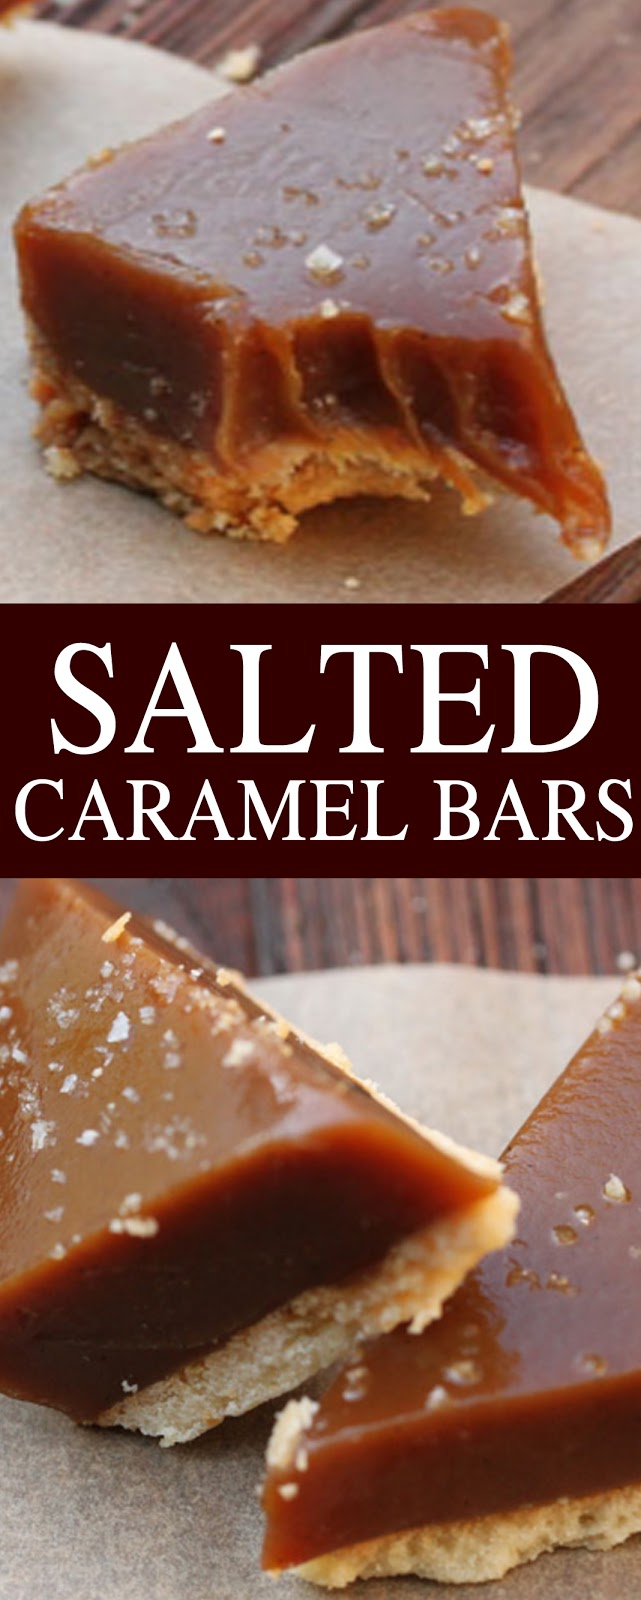 SALTED CARAMEL BARS #bars